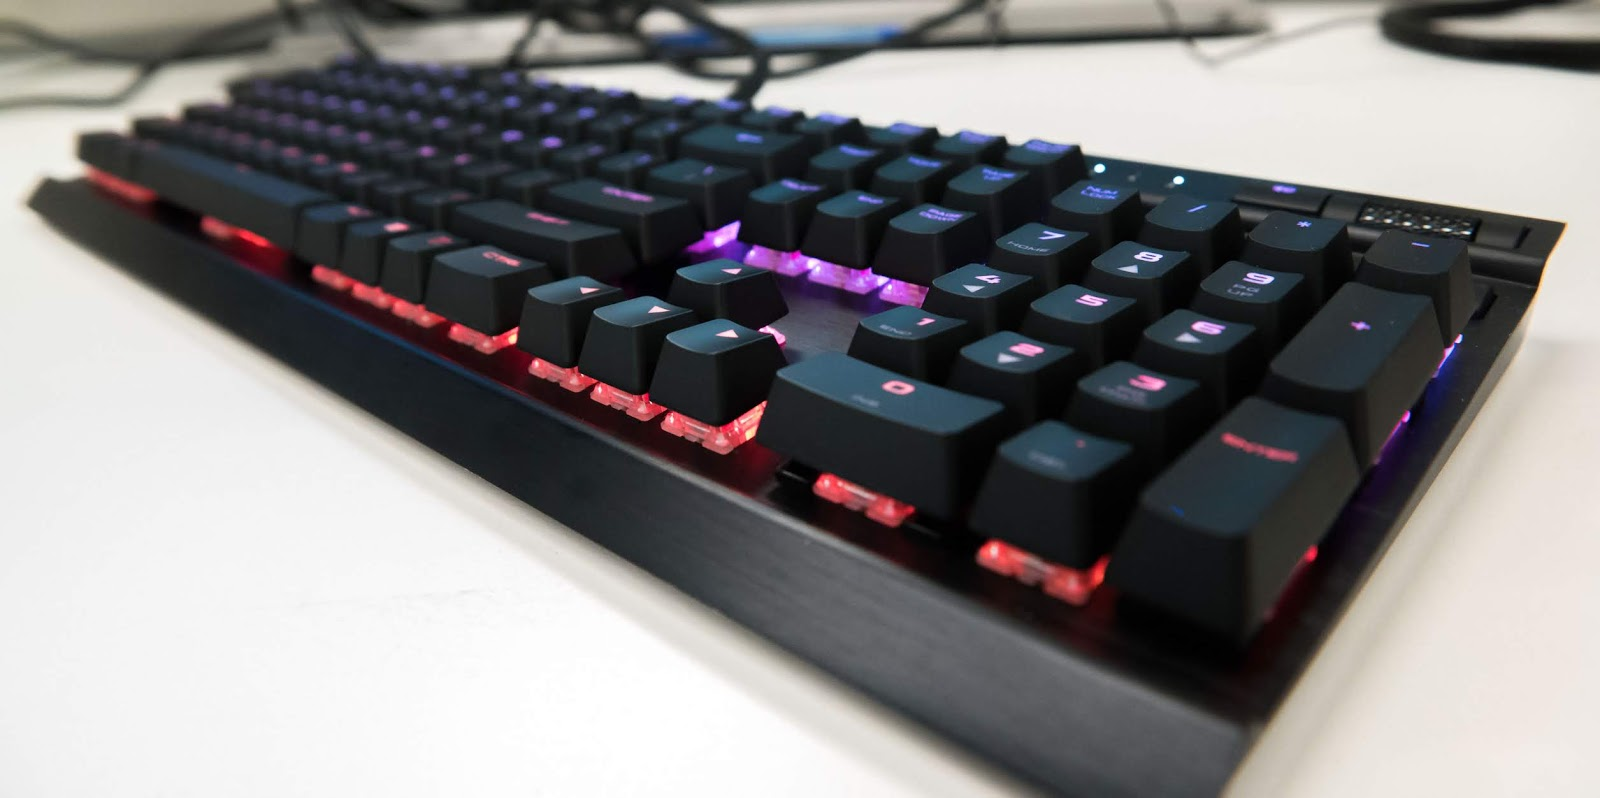 Corsair K70 Rgb Rapidfire Mechanical Keyboard Maz Reviewz